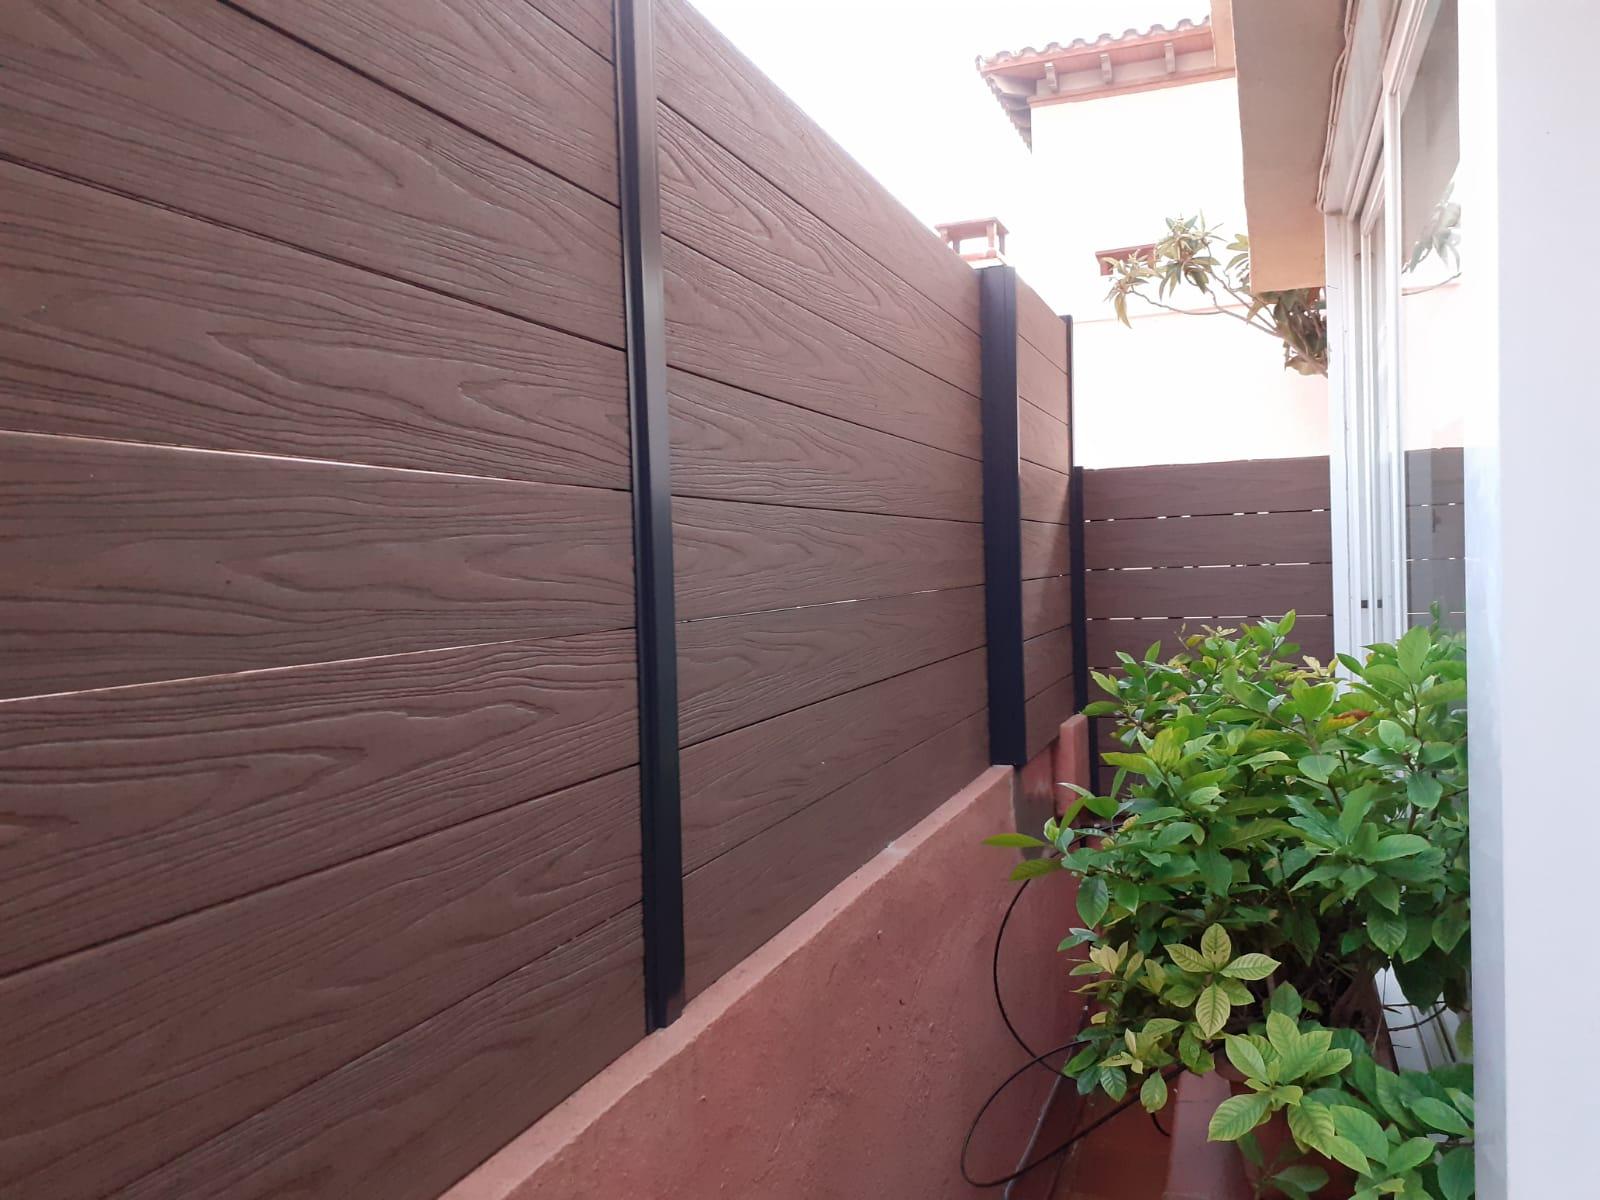 valla de madera sintética efecto madera